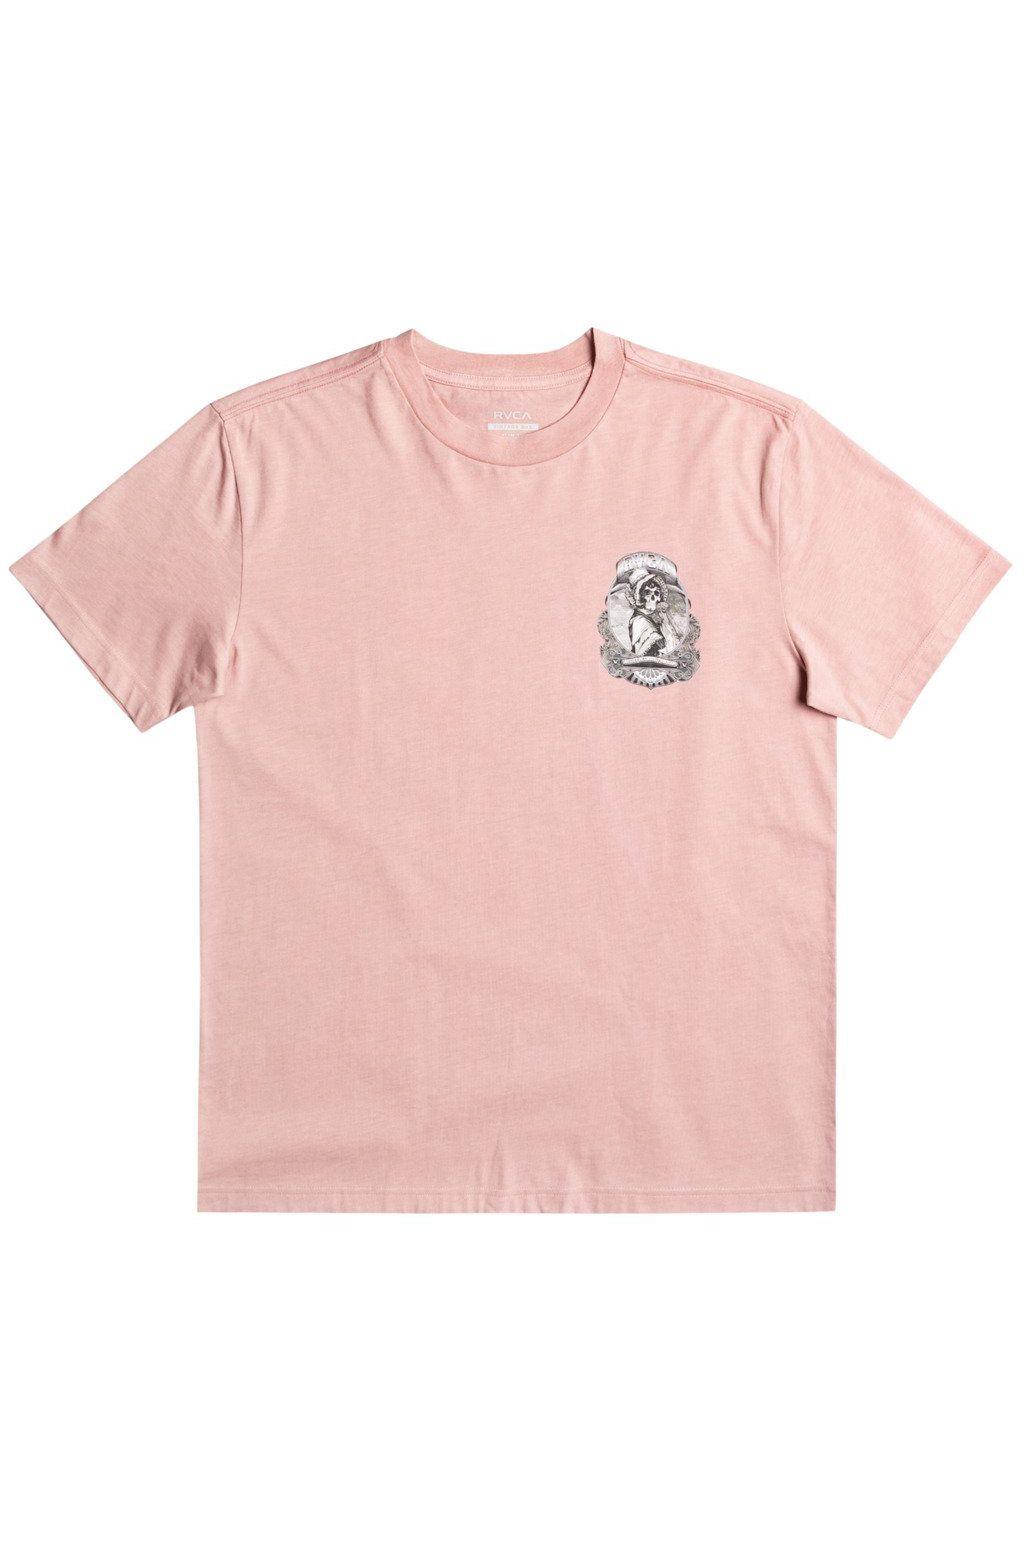 RVCA T-Shirt SKULL BONNET GEORGE THOMPSON Pale Mauve